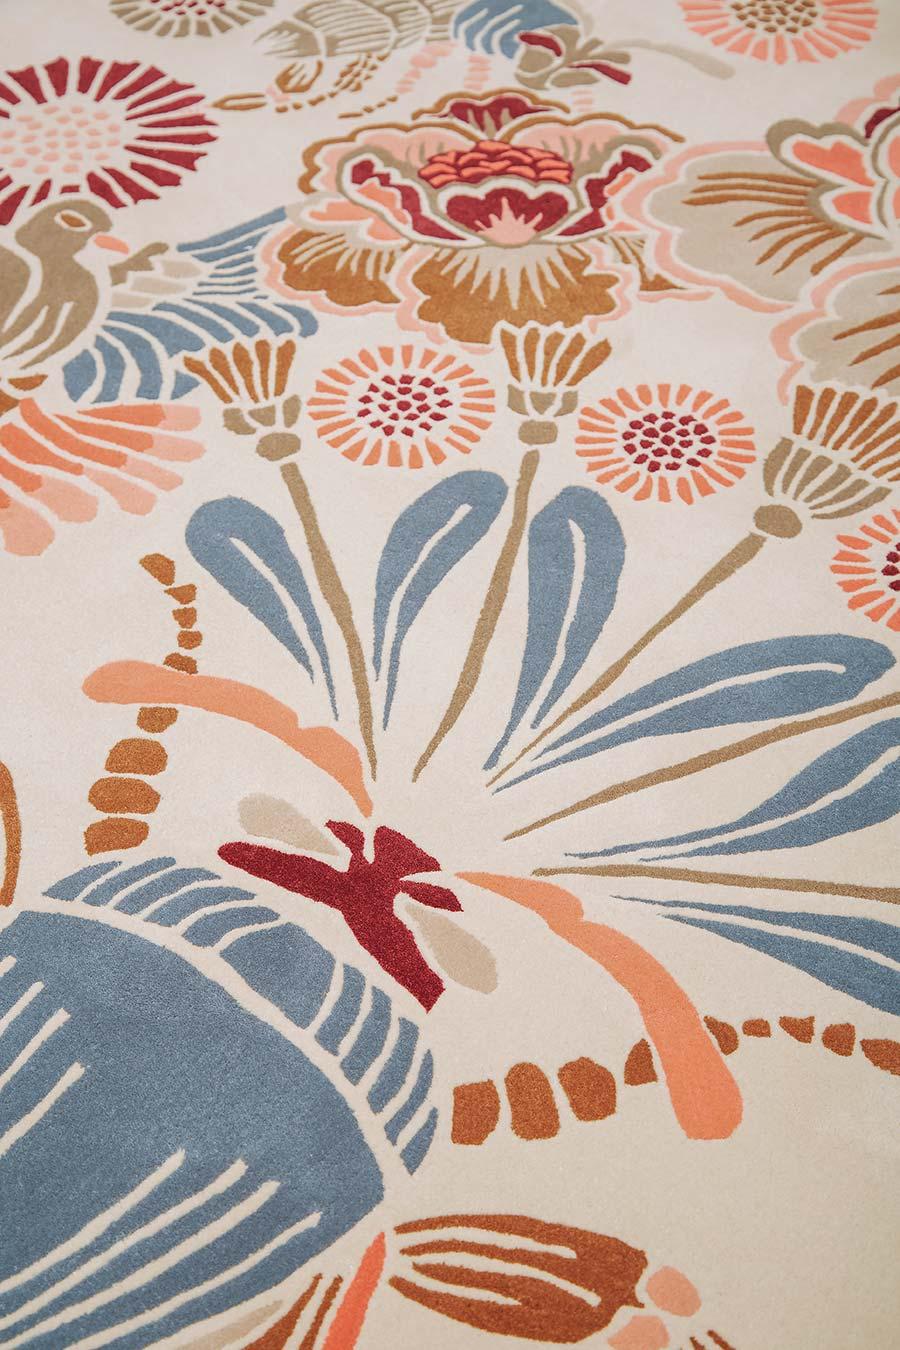 Detailed image of floral Honeybee rug by House Of Heras